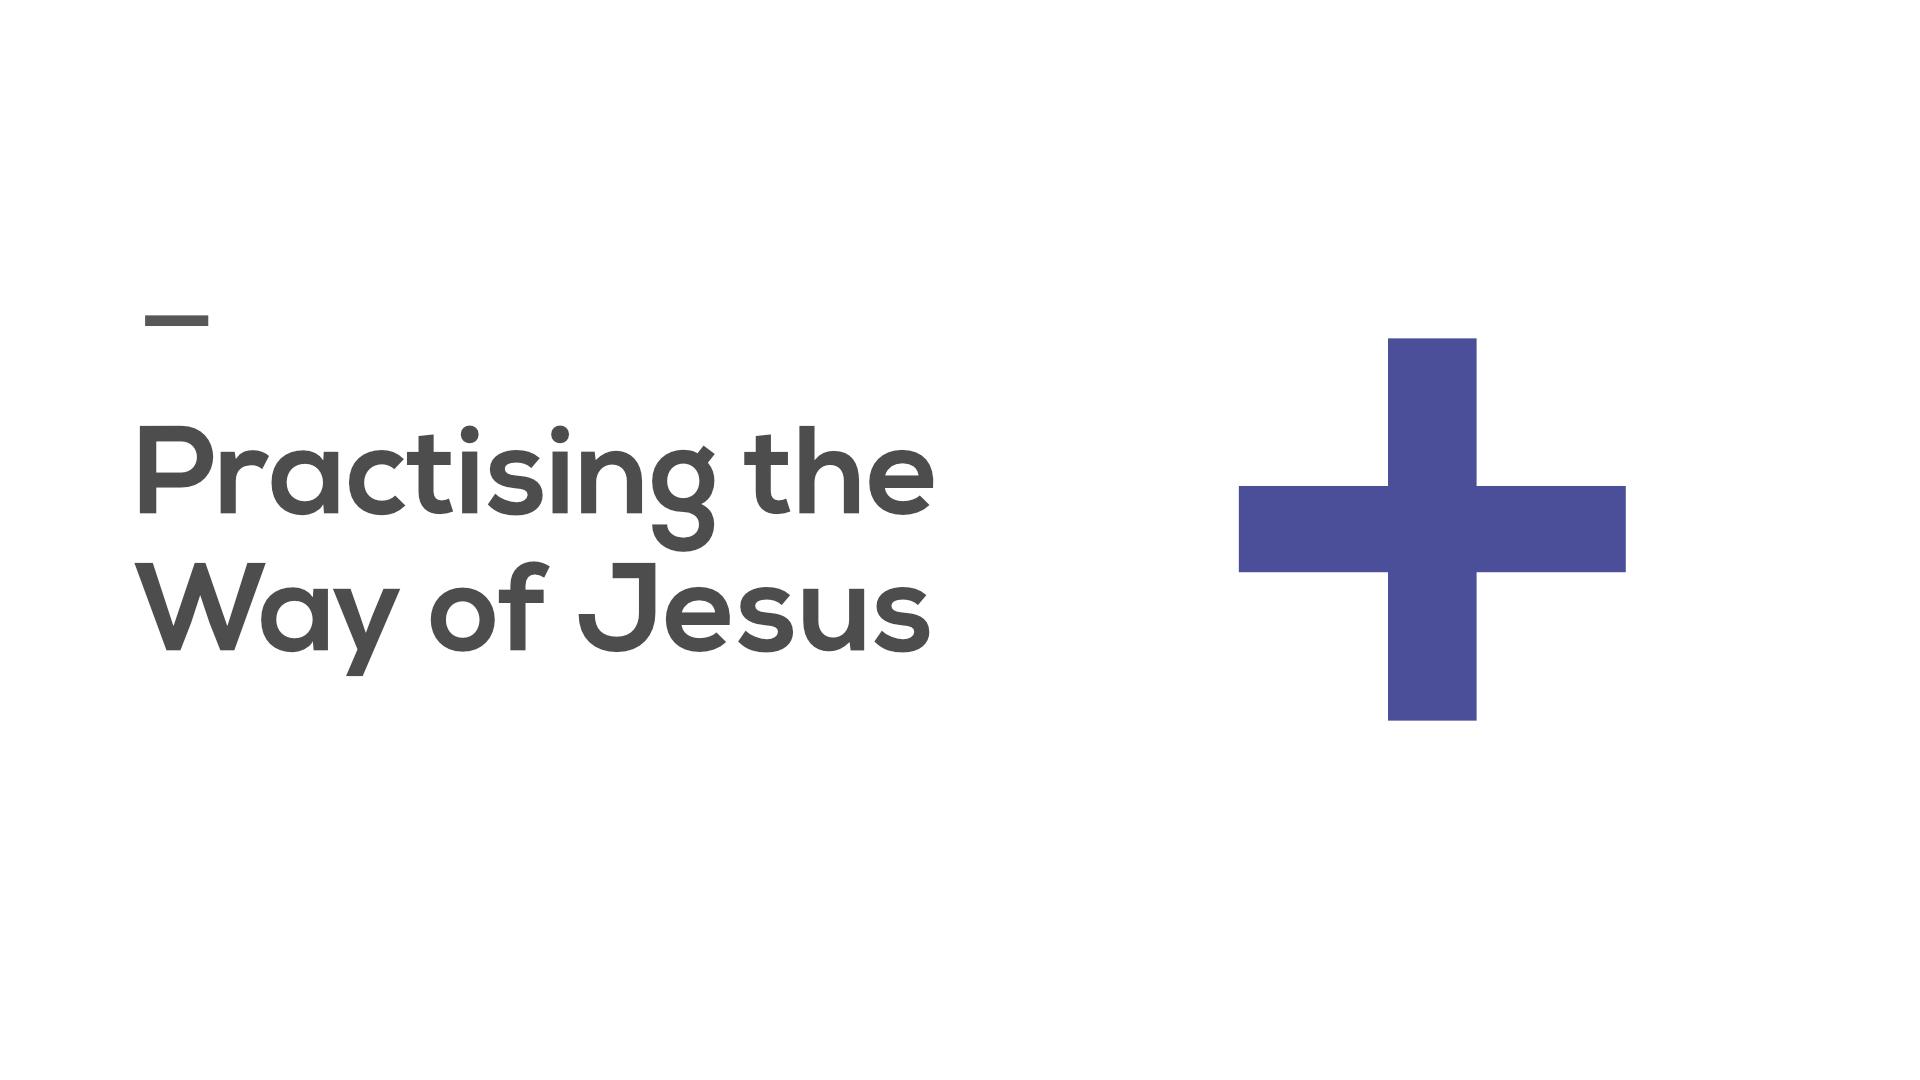 Practising the Way of Jesus 1 copy 2.jpg